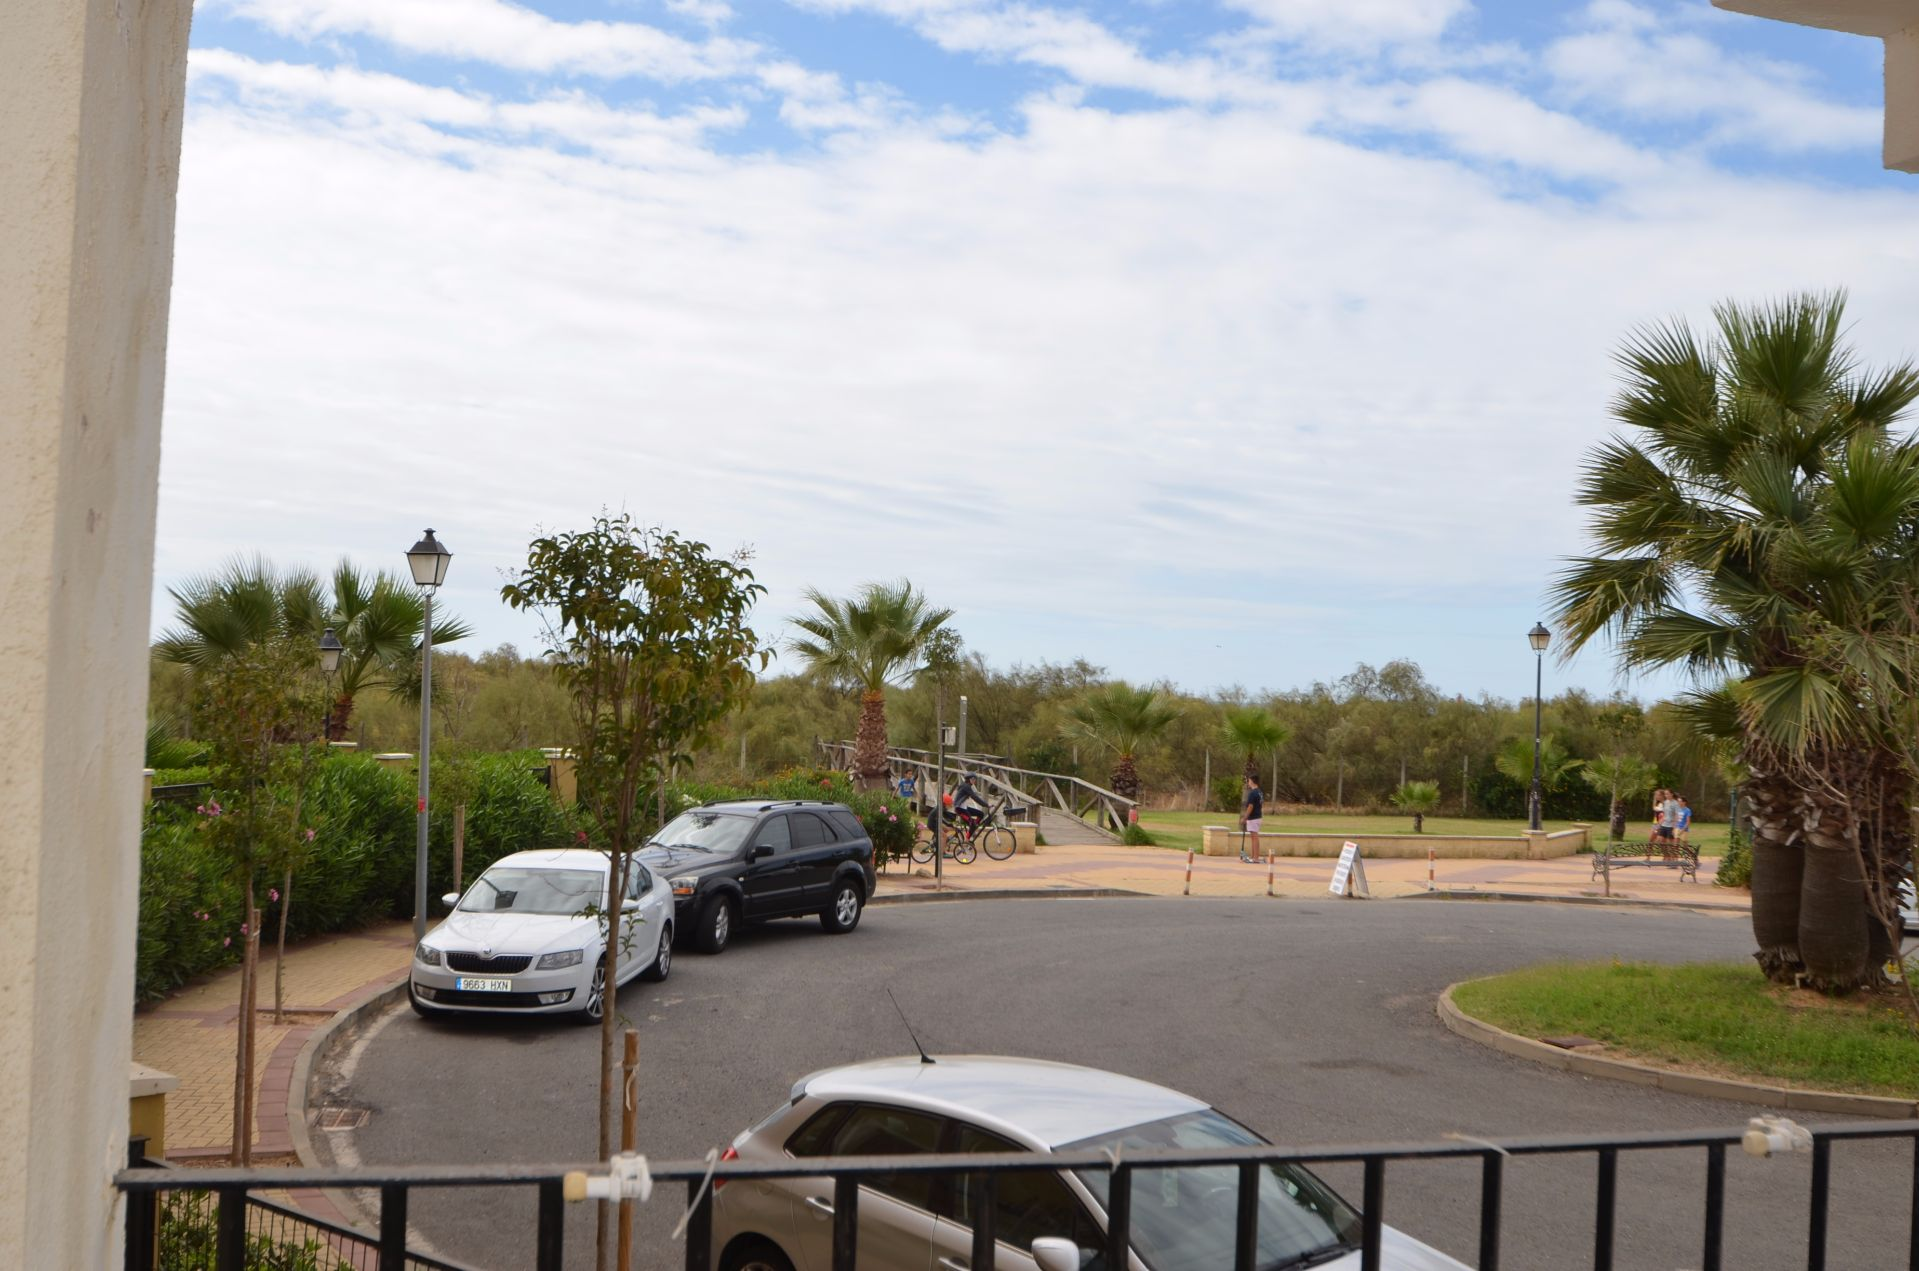 Lejlighed i Ayamonte, Residencial Playa Grande, salg